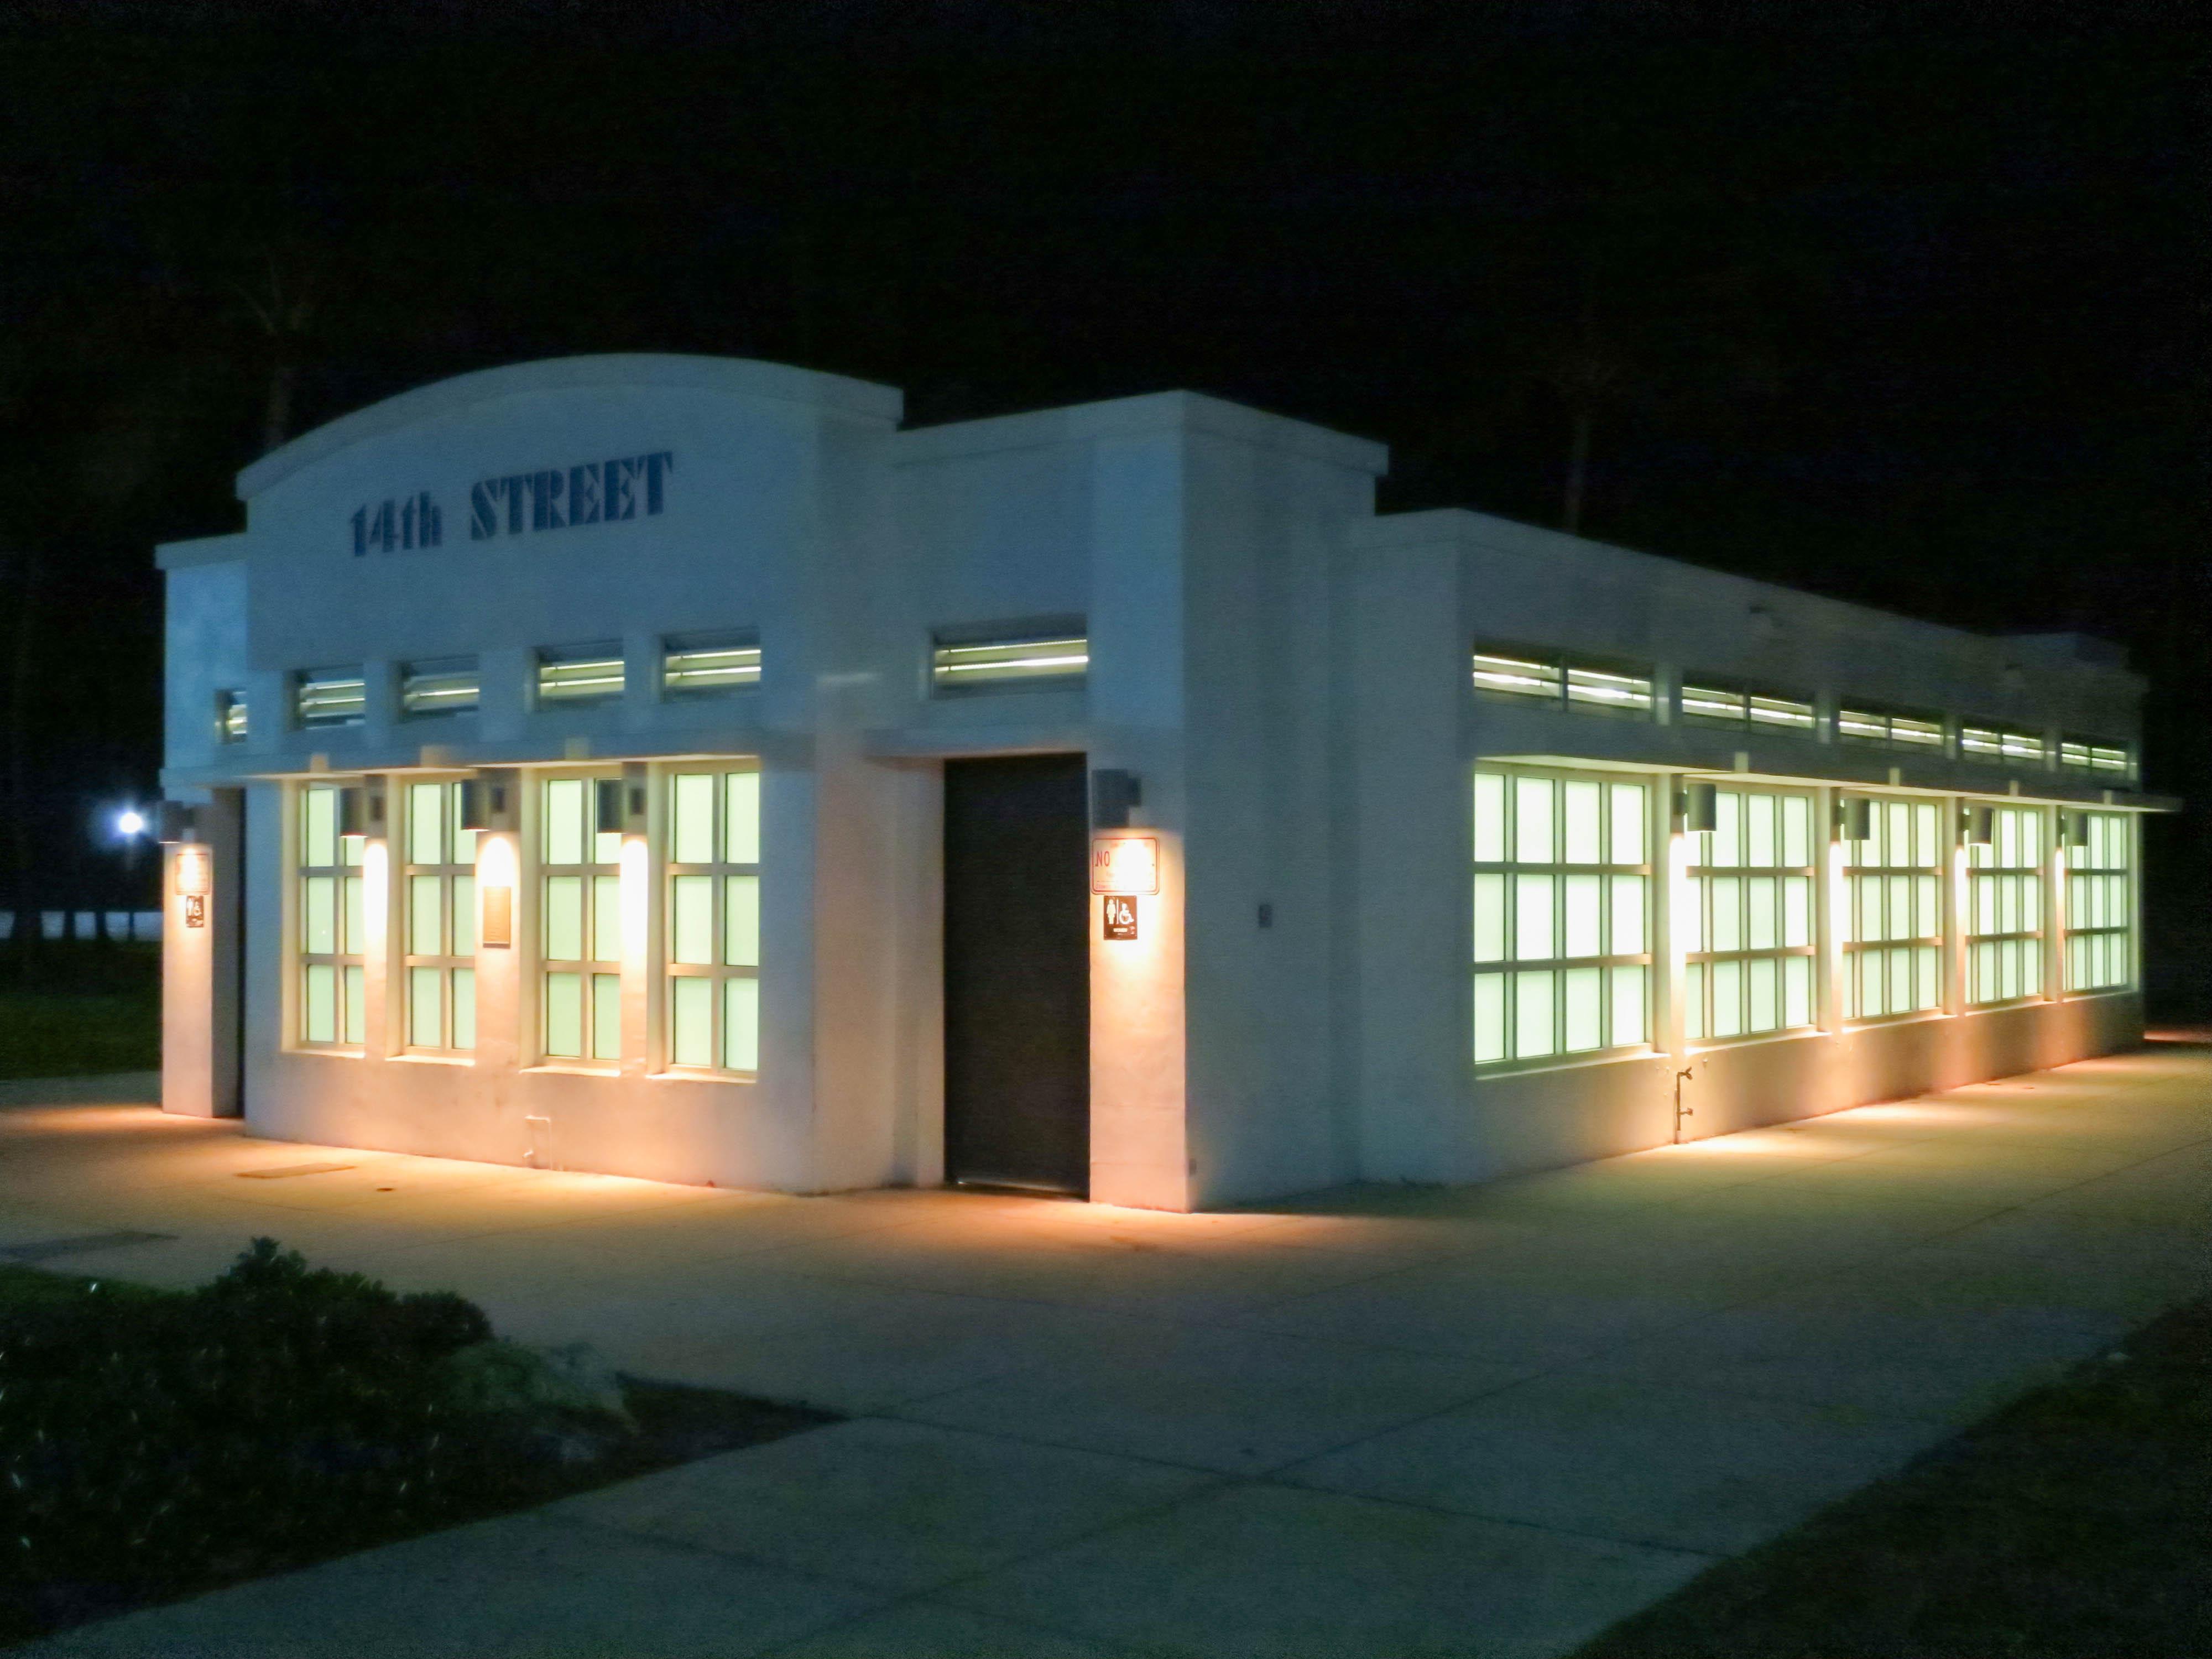 14th Street Restrooms - Ocean Drive - South Beach, Florida